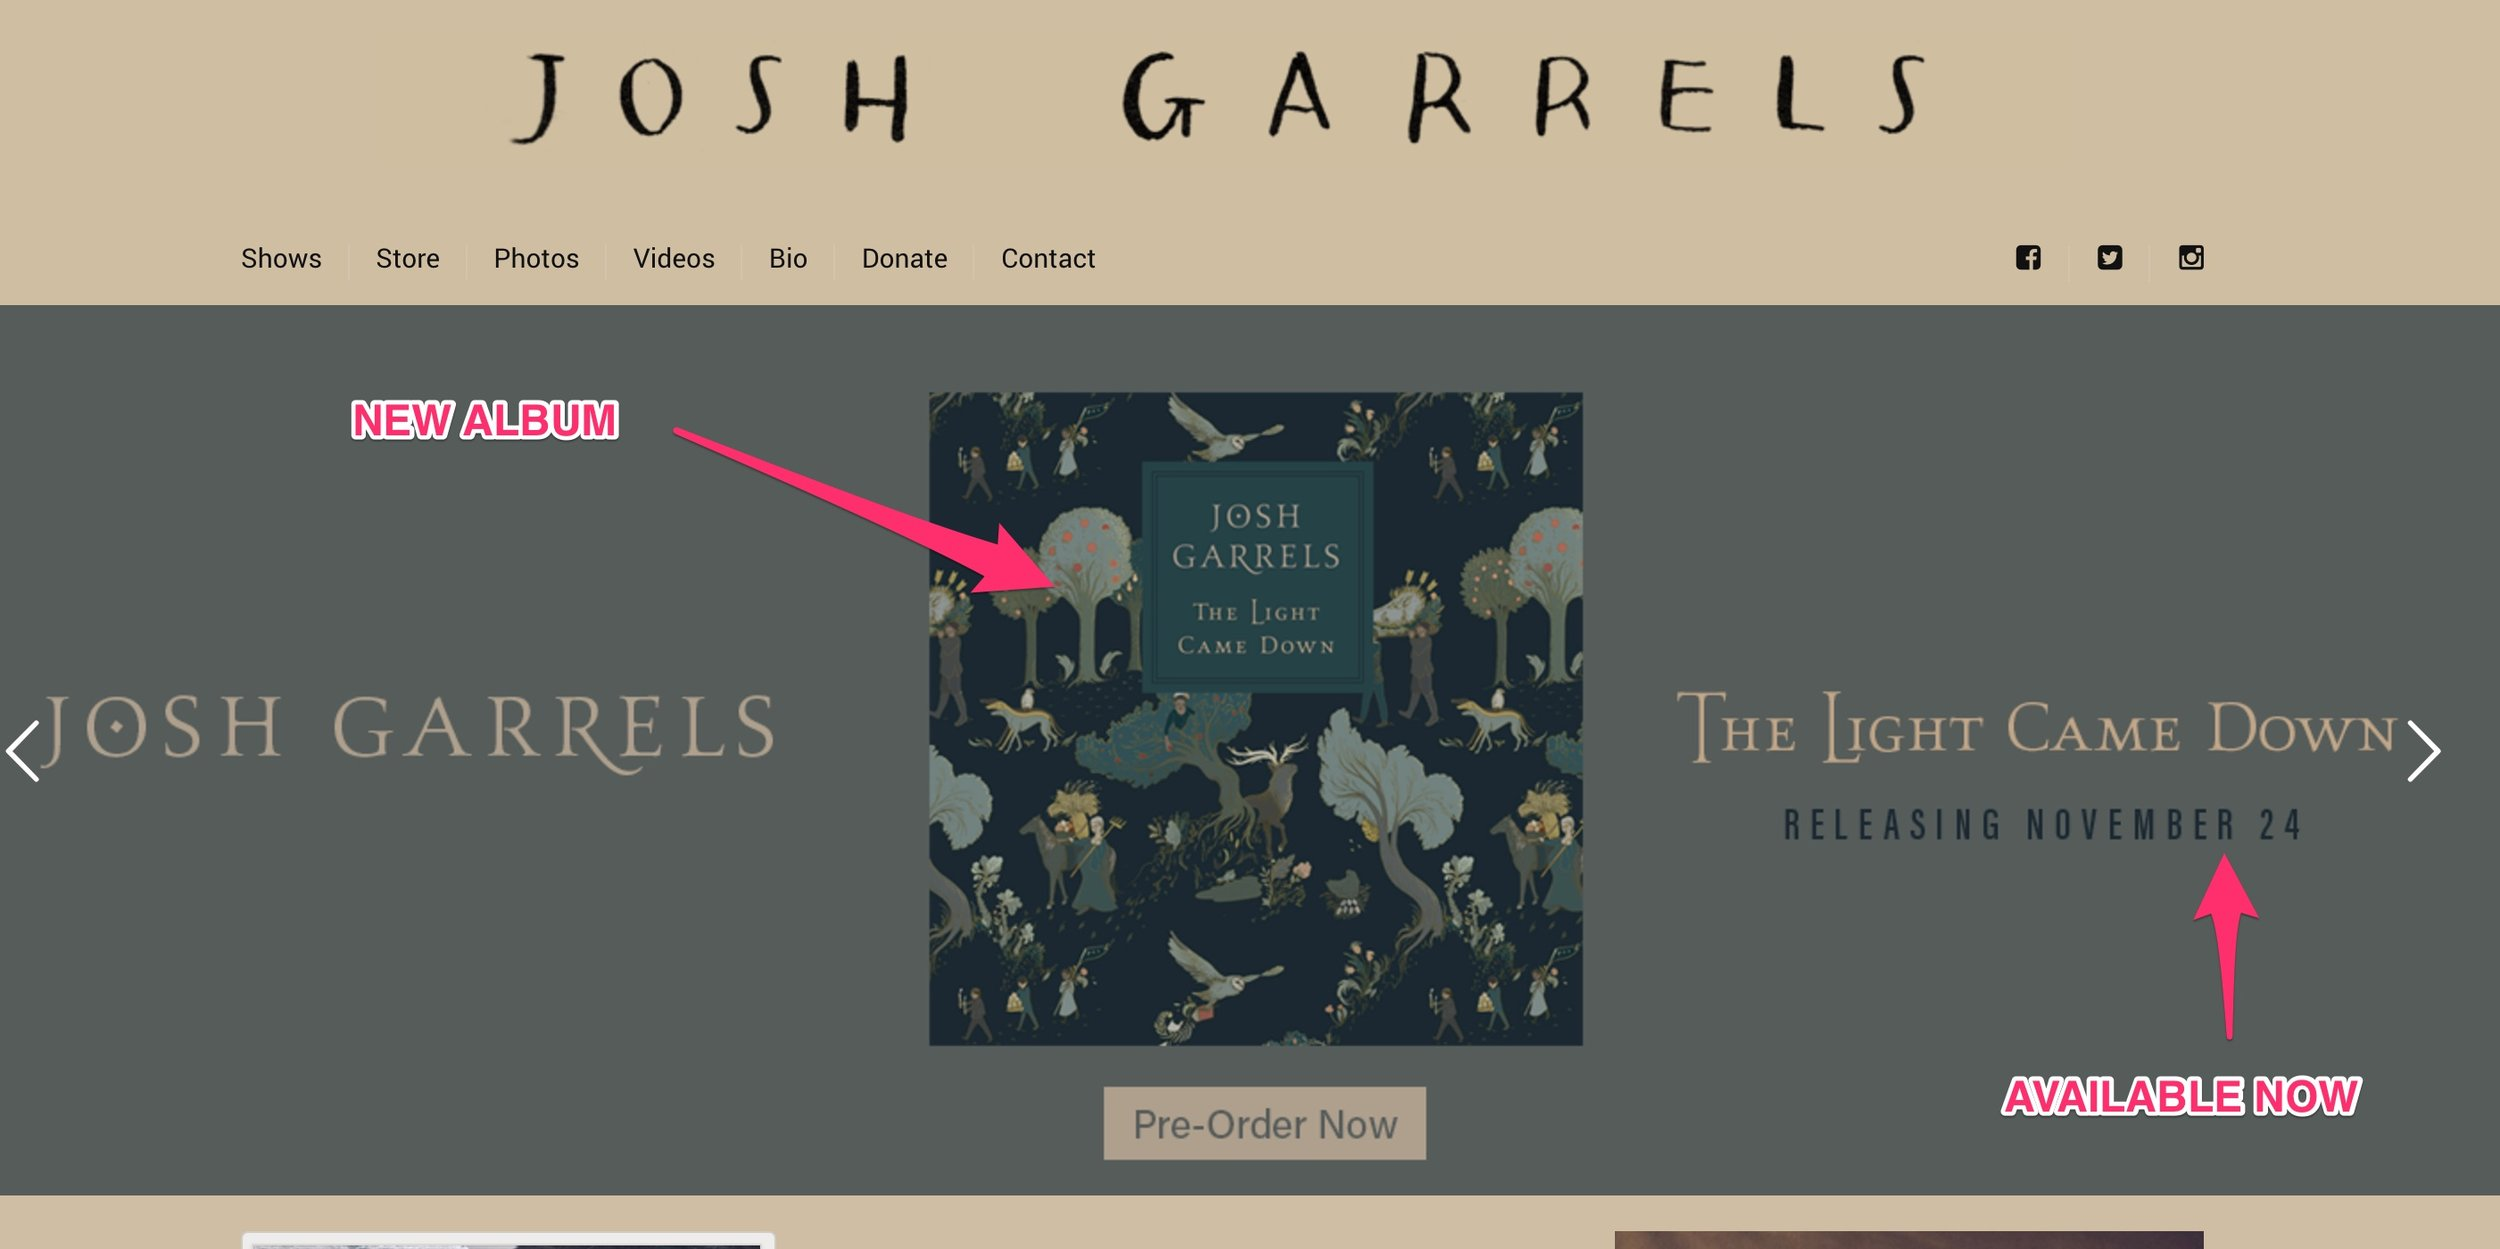 Josh Garrels New Album